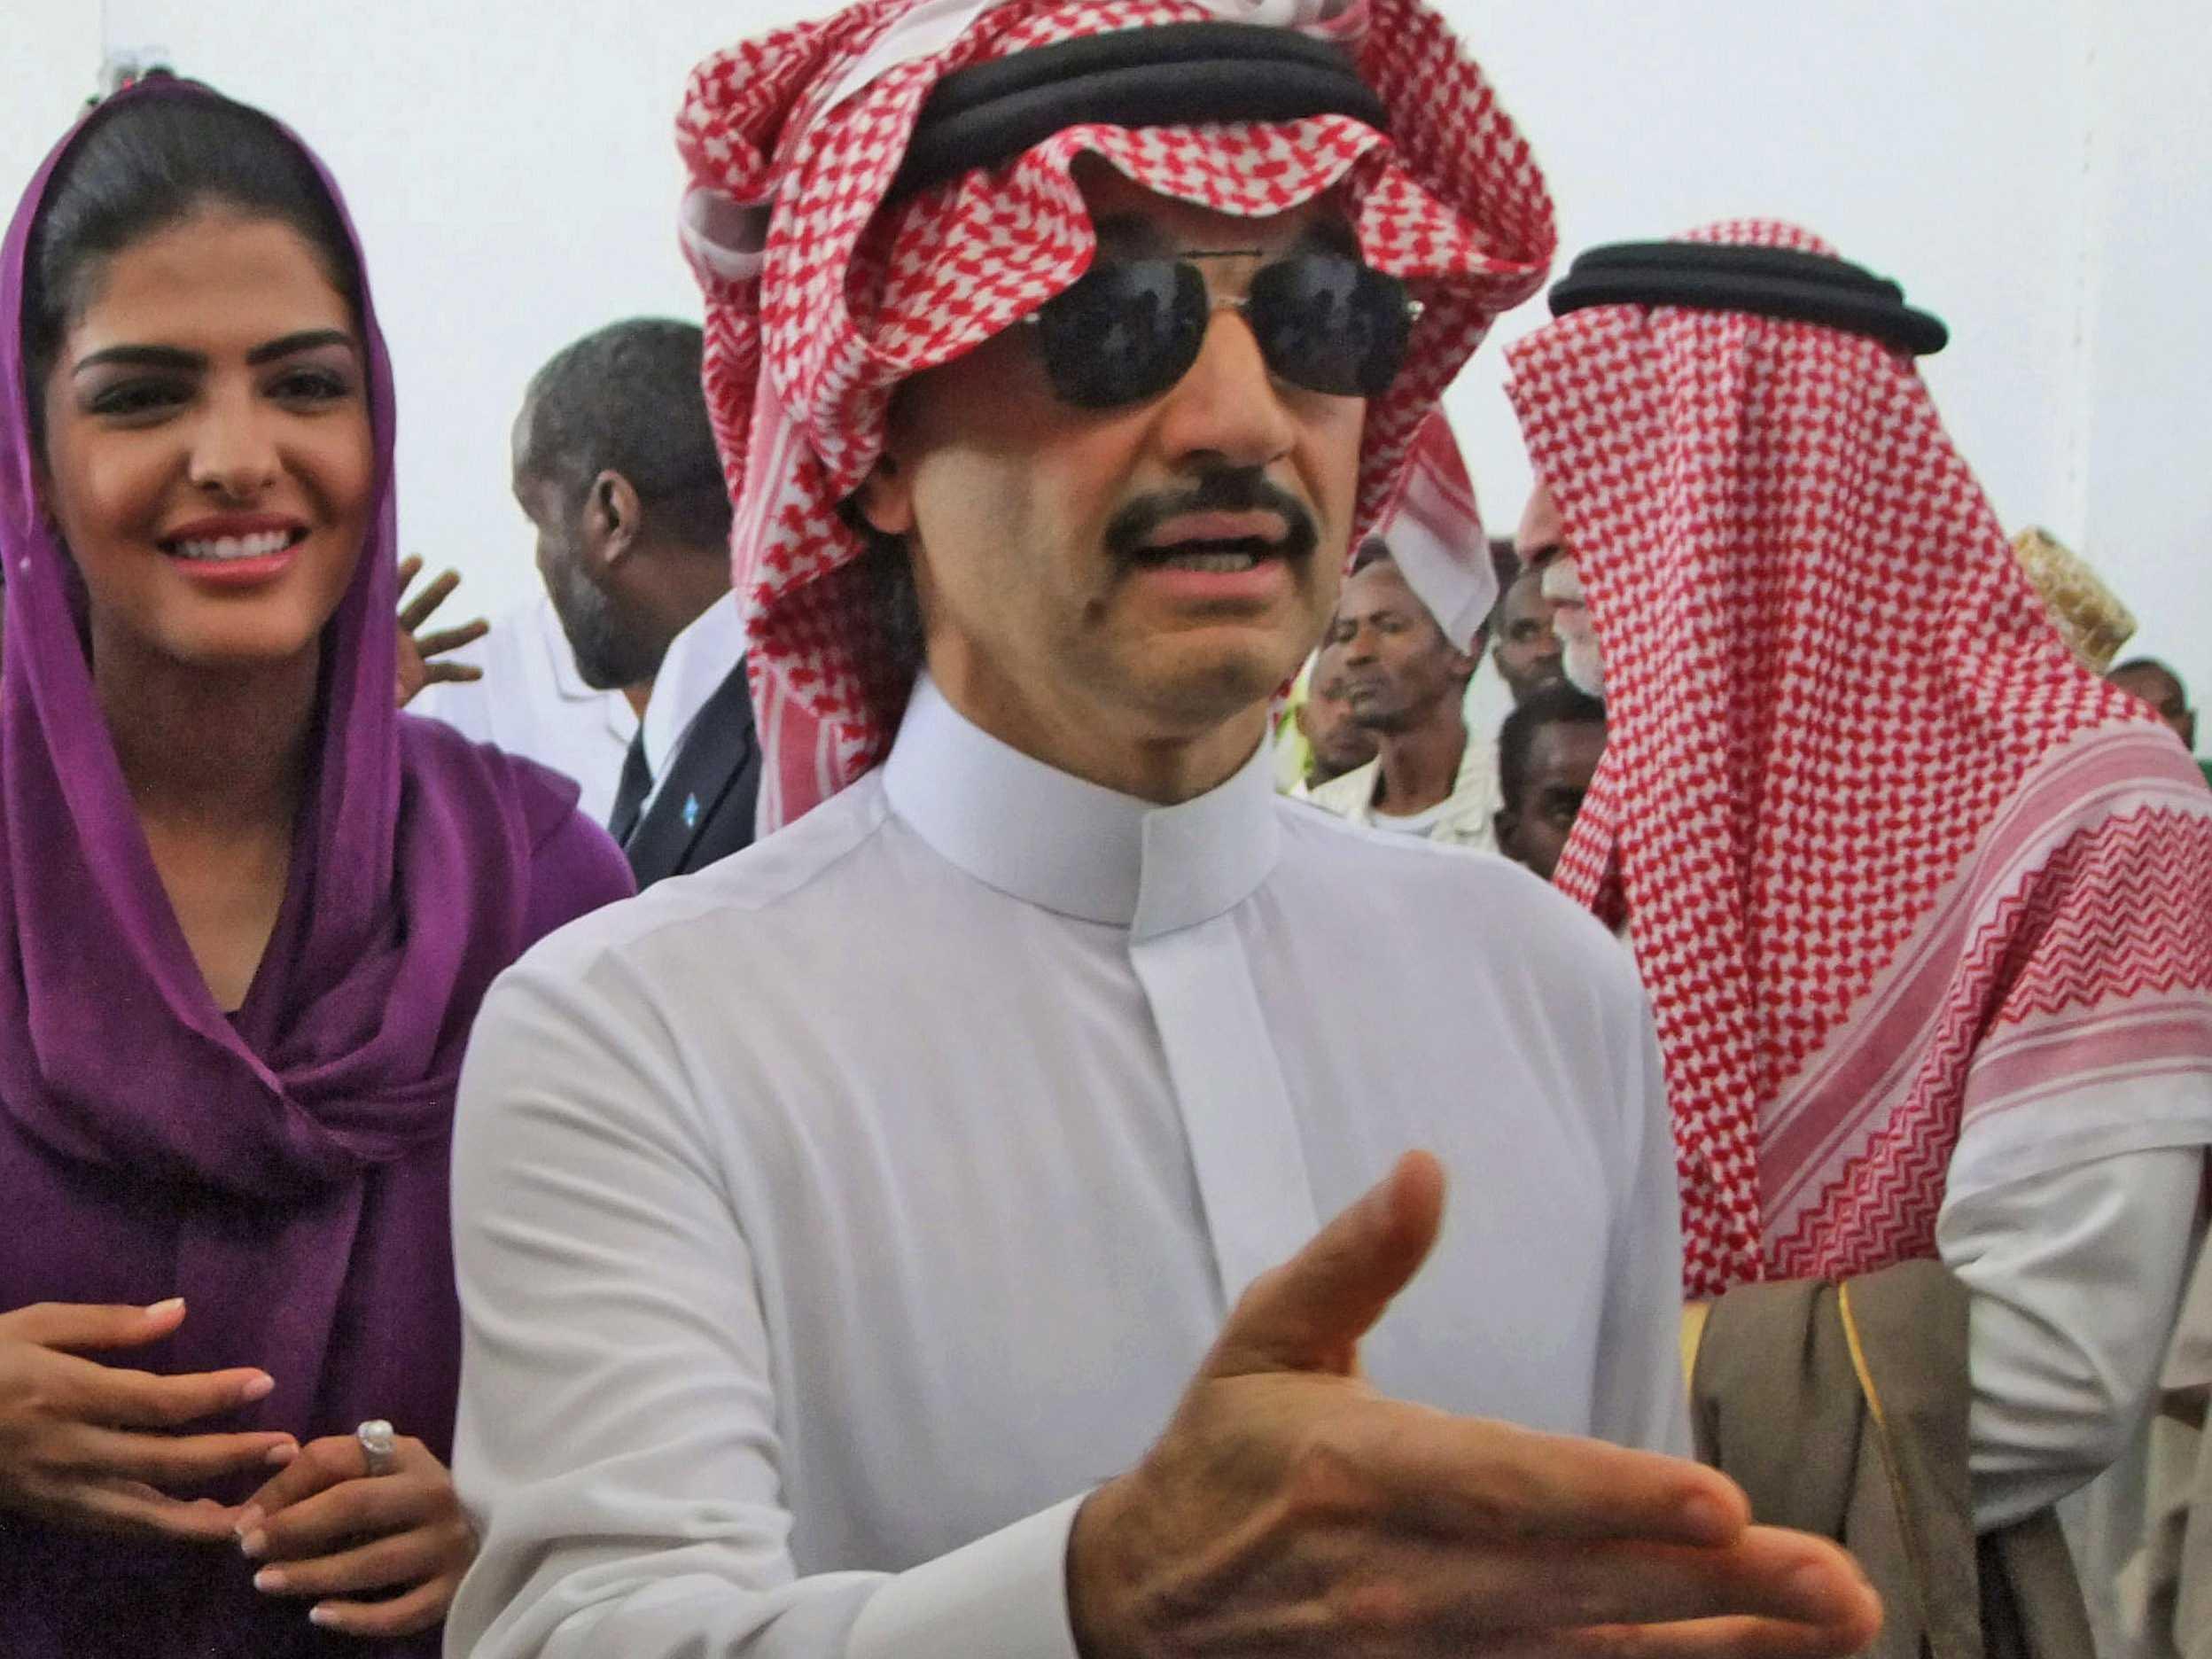 Принц-миллиардер Аль-Валид бин Талал - один из арестованных